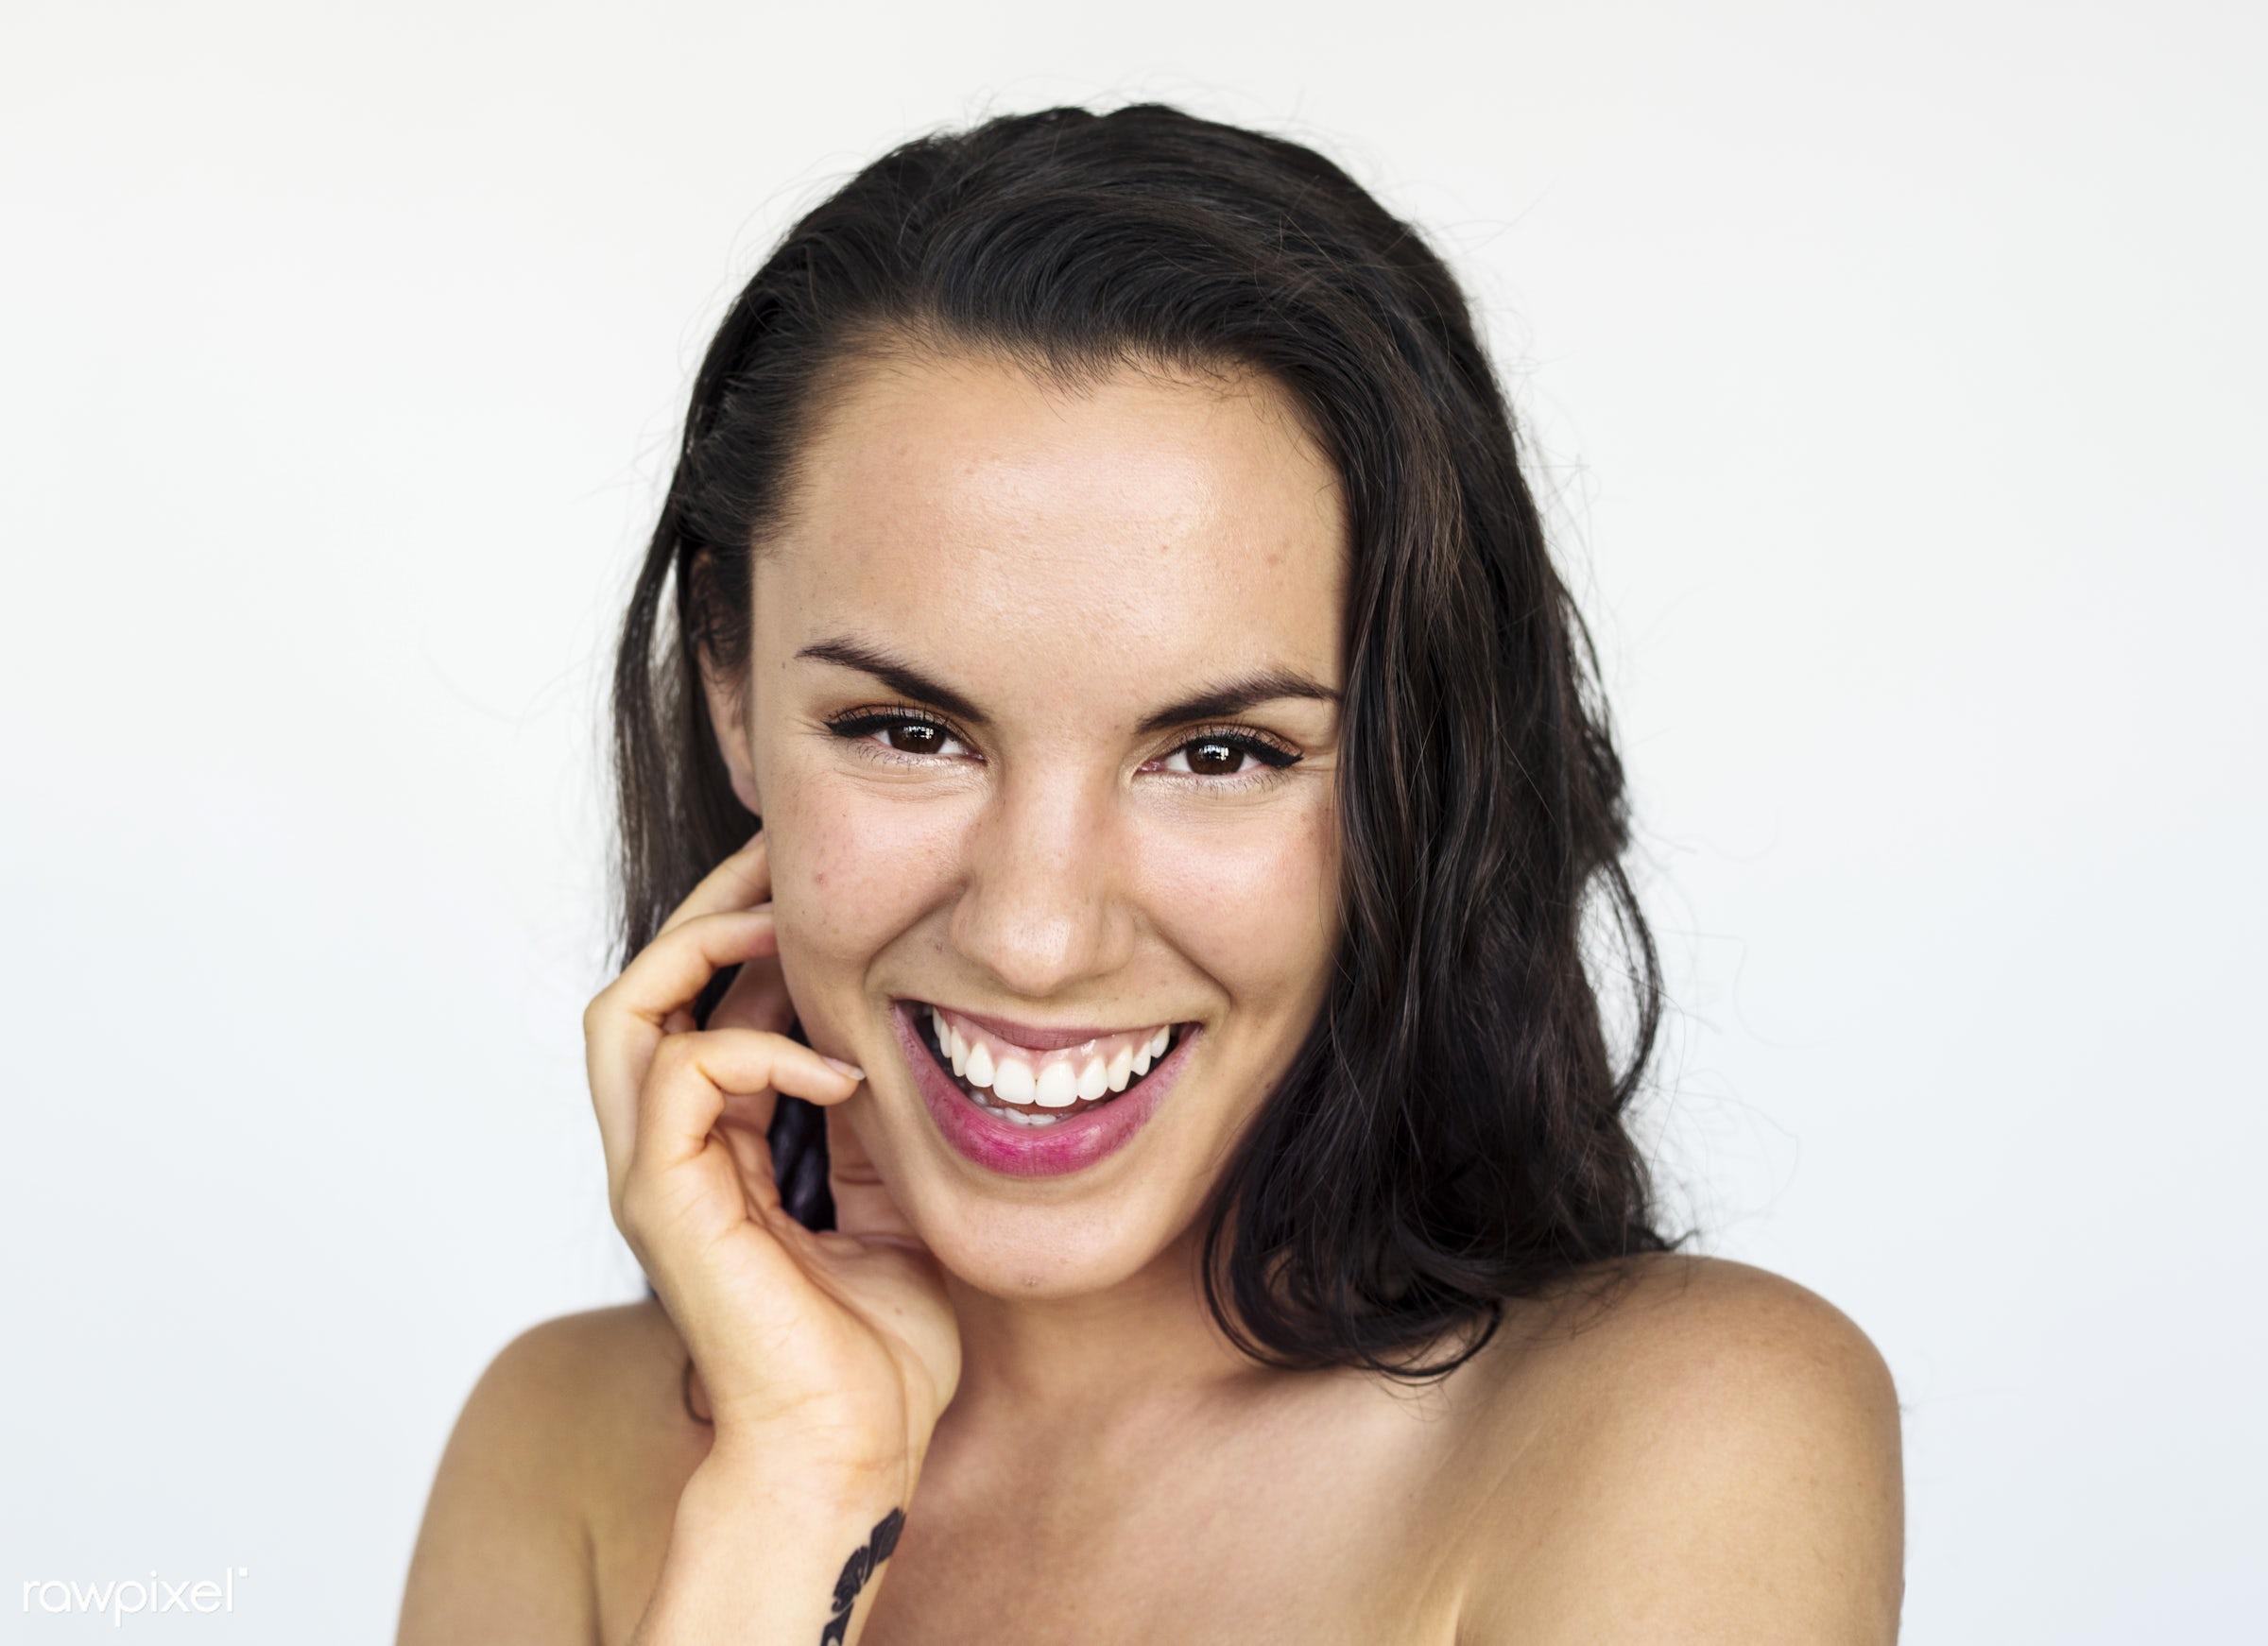 Portrait of a European woman - adult, alone, american, caucasian, cheerful, chic, closeup, content, croatian, europe,...